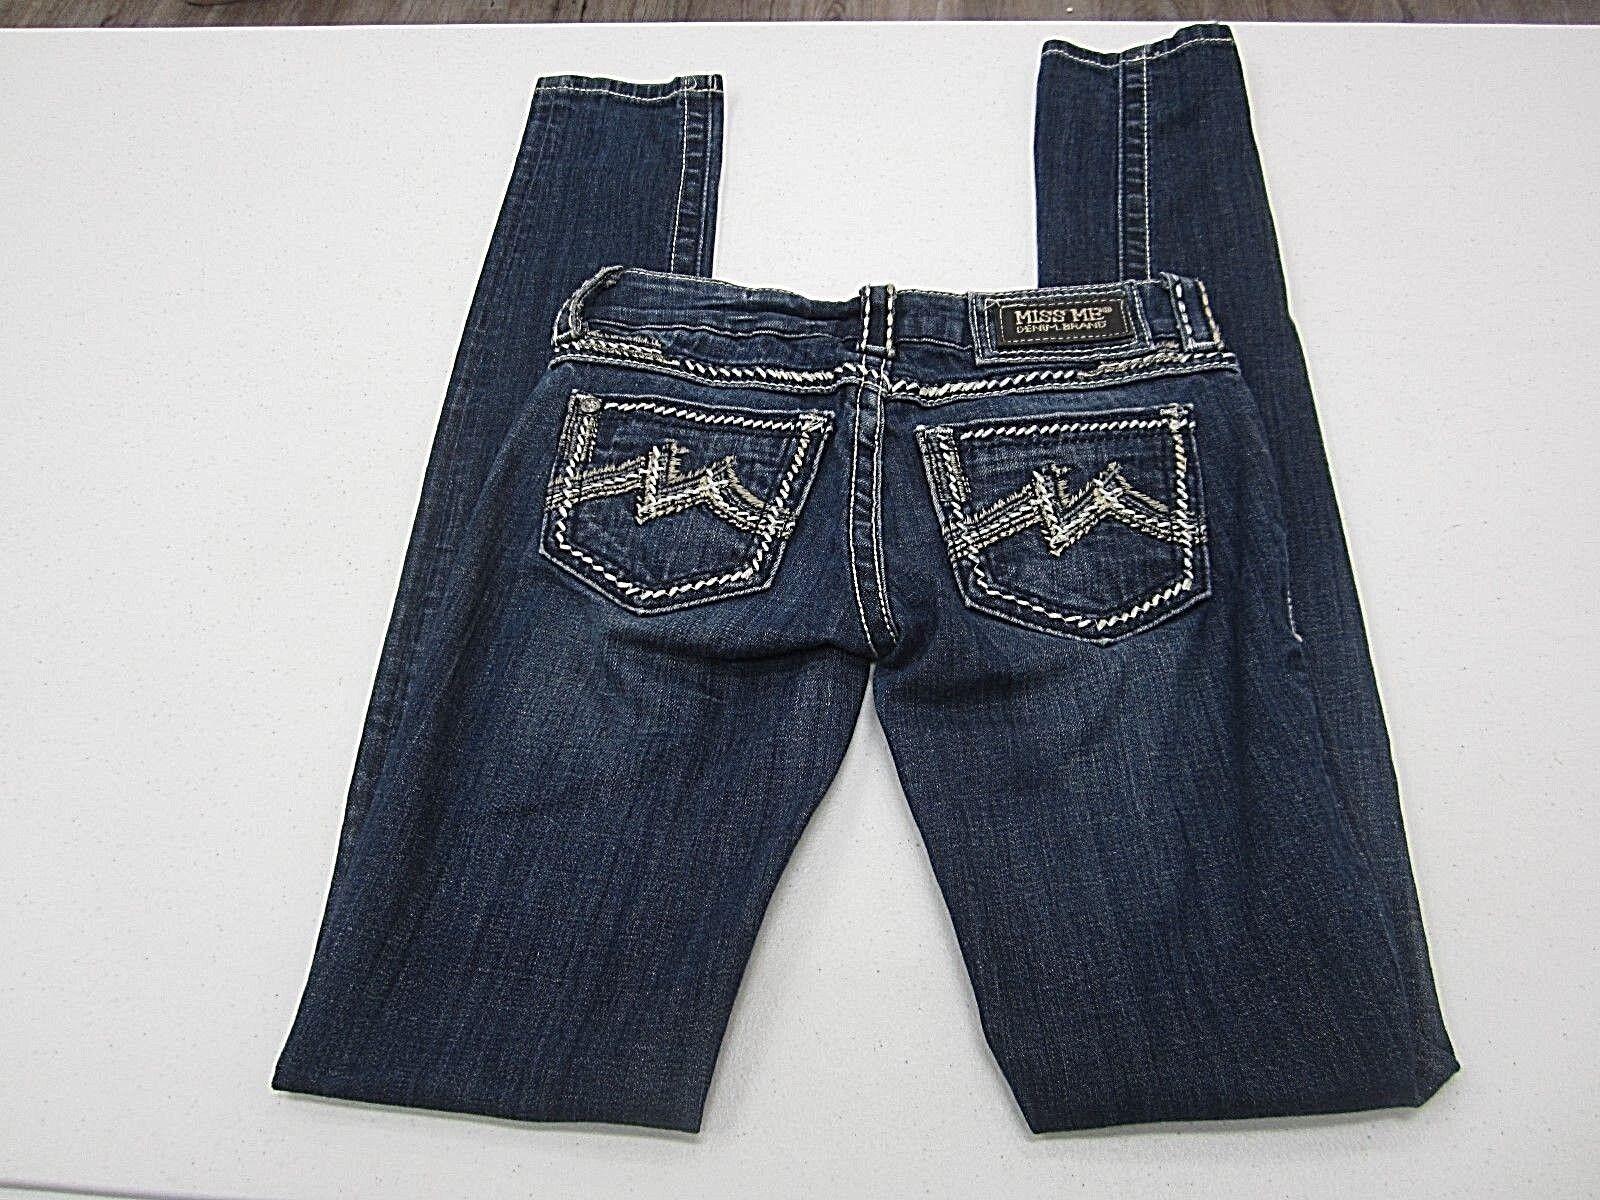 MINT  MISS ME Skinny JE1043S2X Embroidered Dark Jeans Size 23 X 35